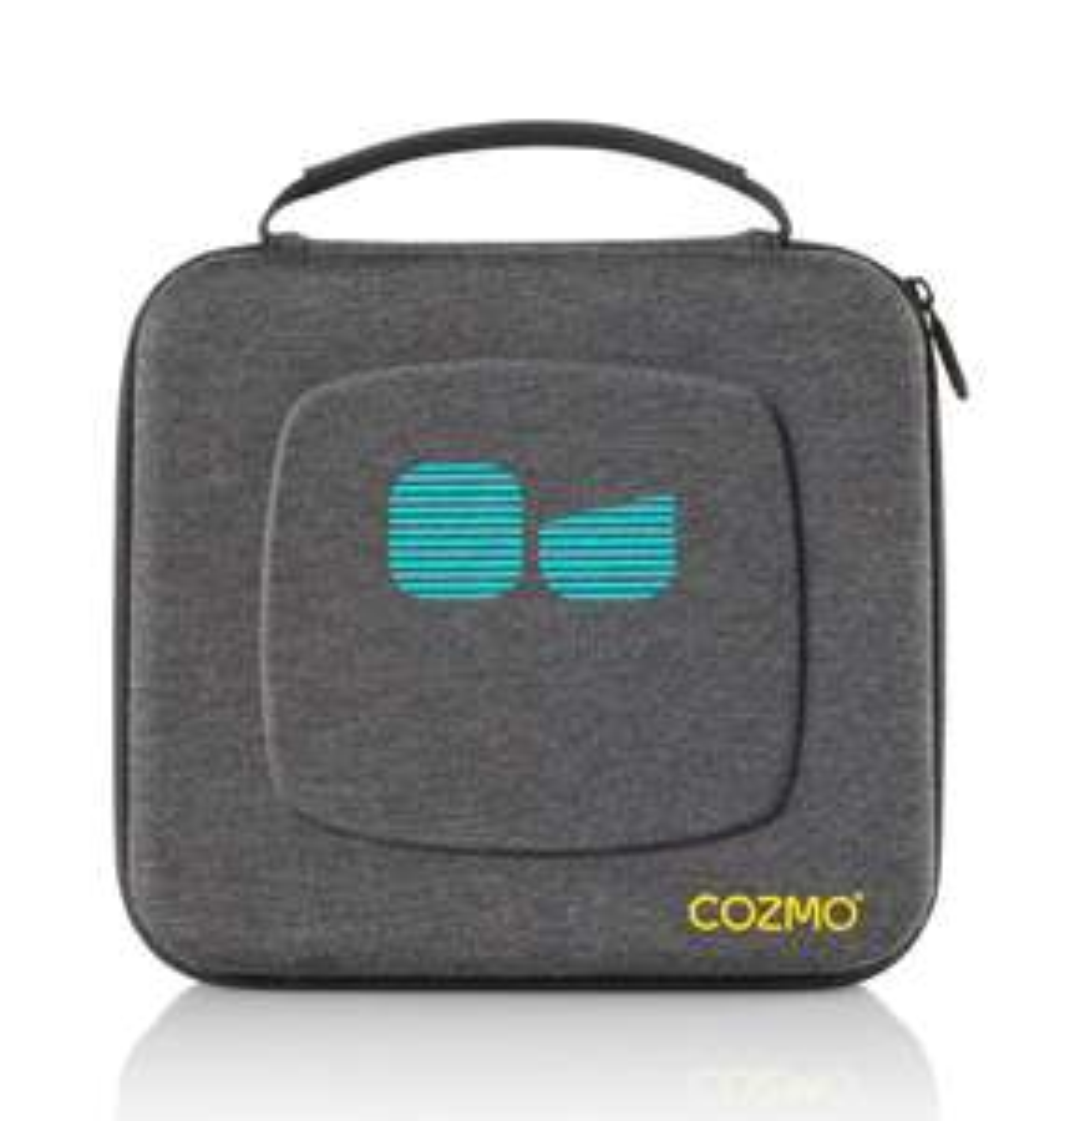 Cozmo Carry Case £8.99 @ Argos